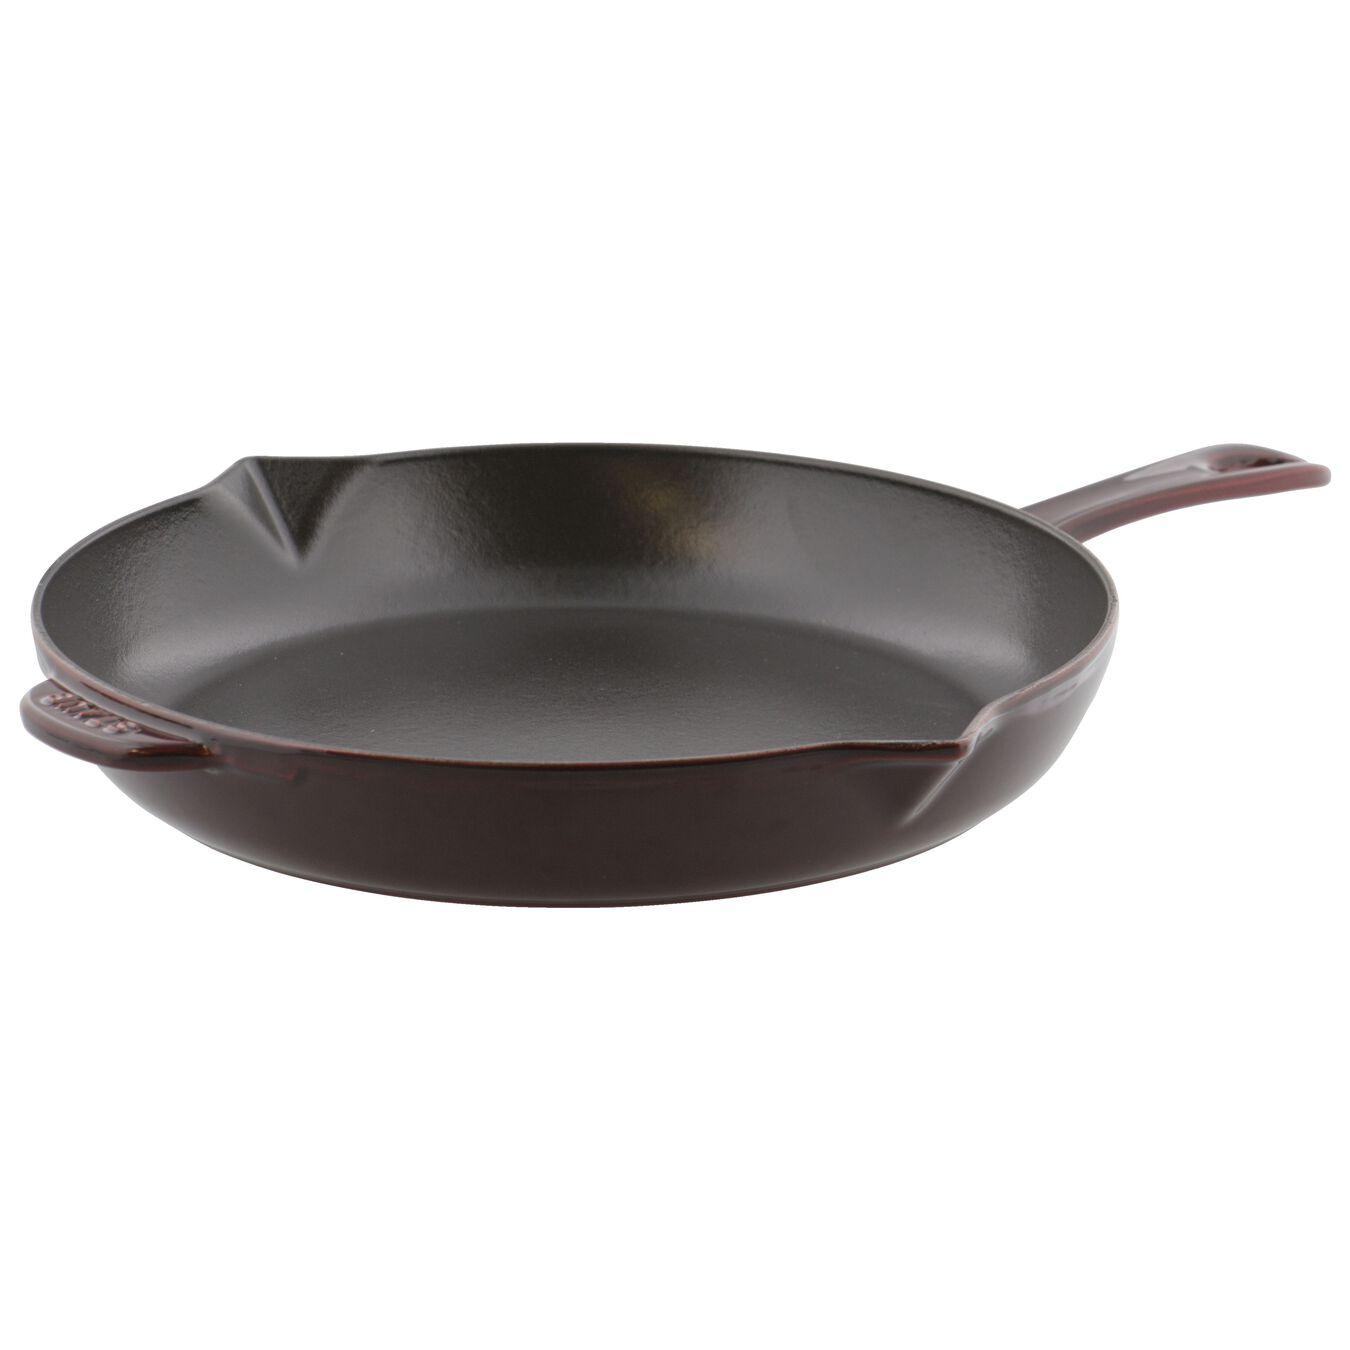 26 cm / 10 inch Frying pan, grenadine-red,,large 1